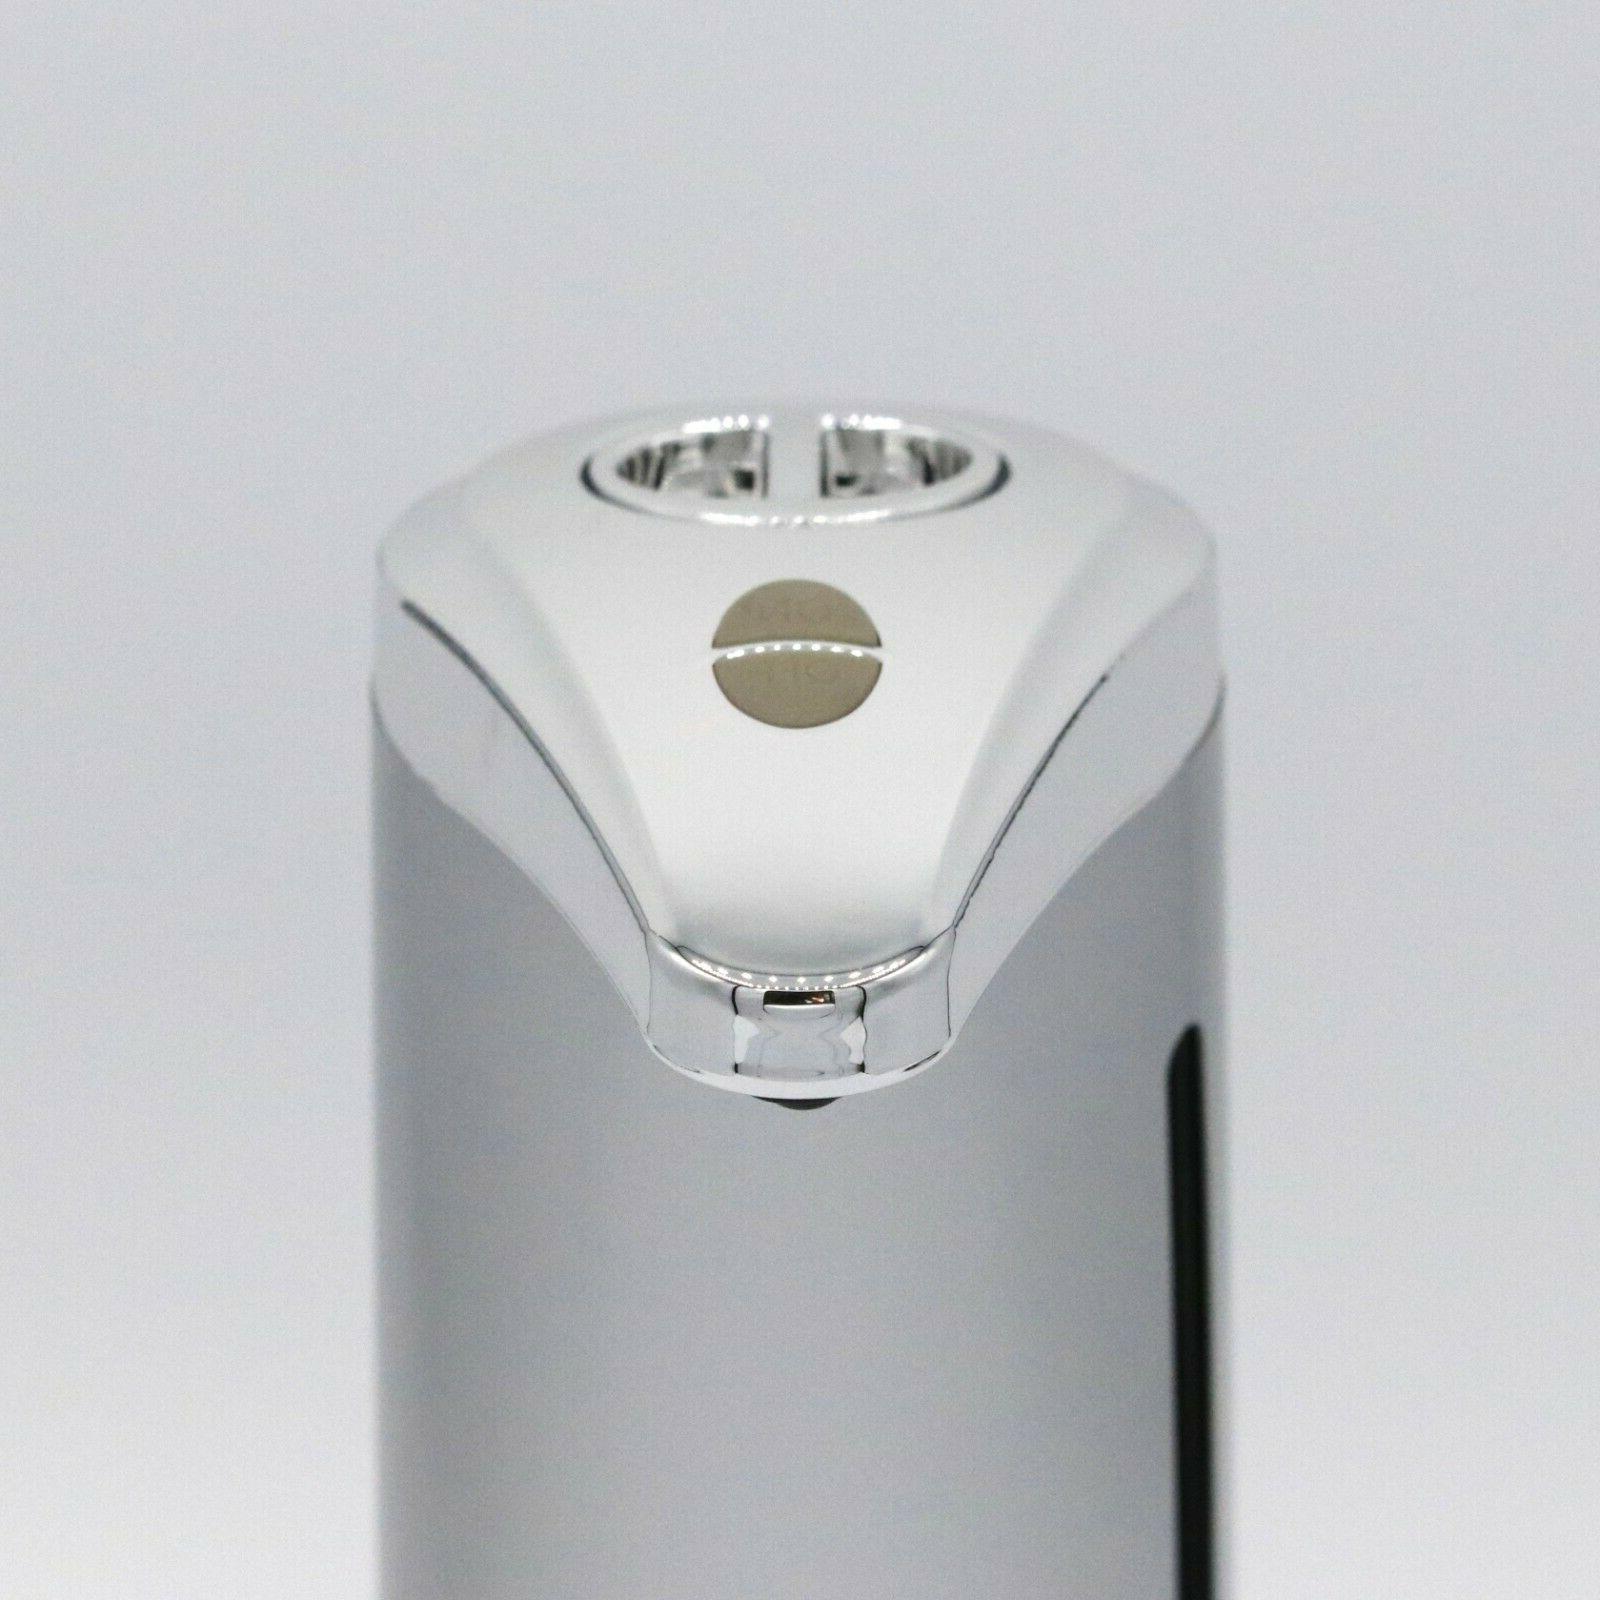 Automatic Touchless Dispenser Hands Sensor Kitchen Silver